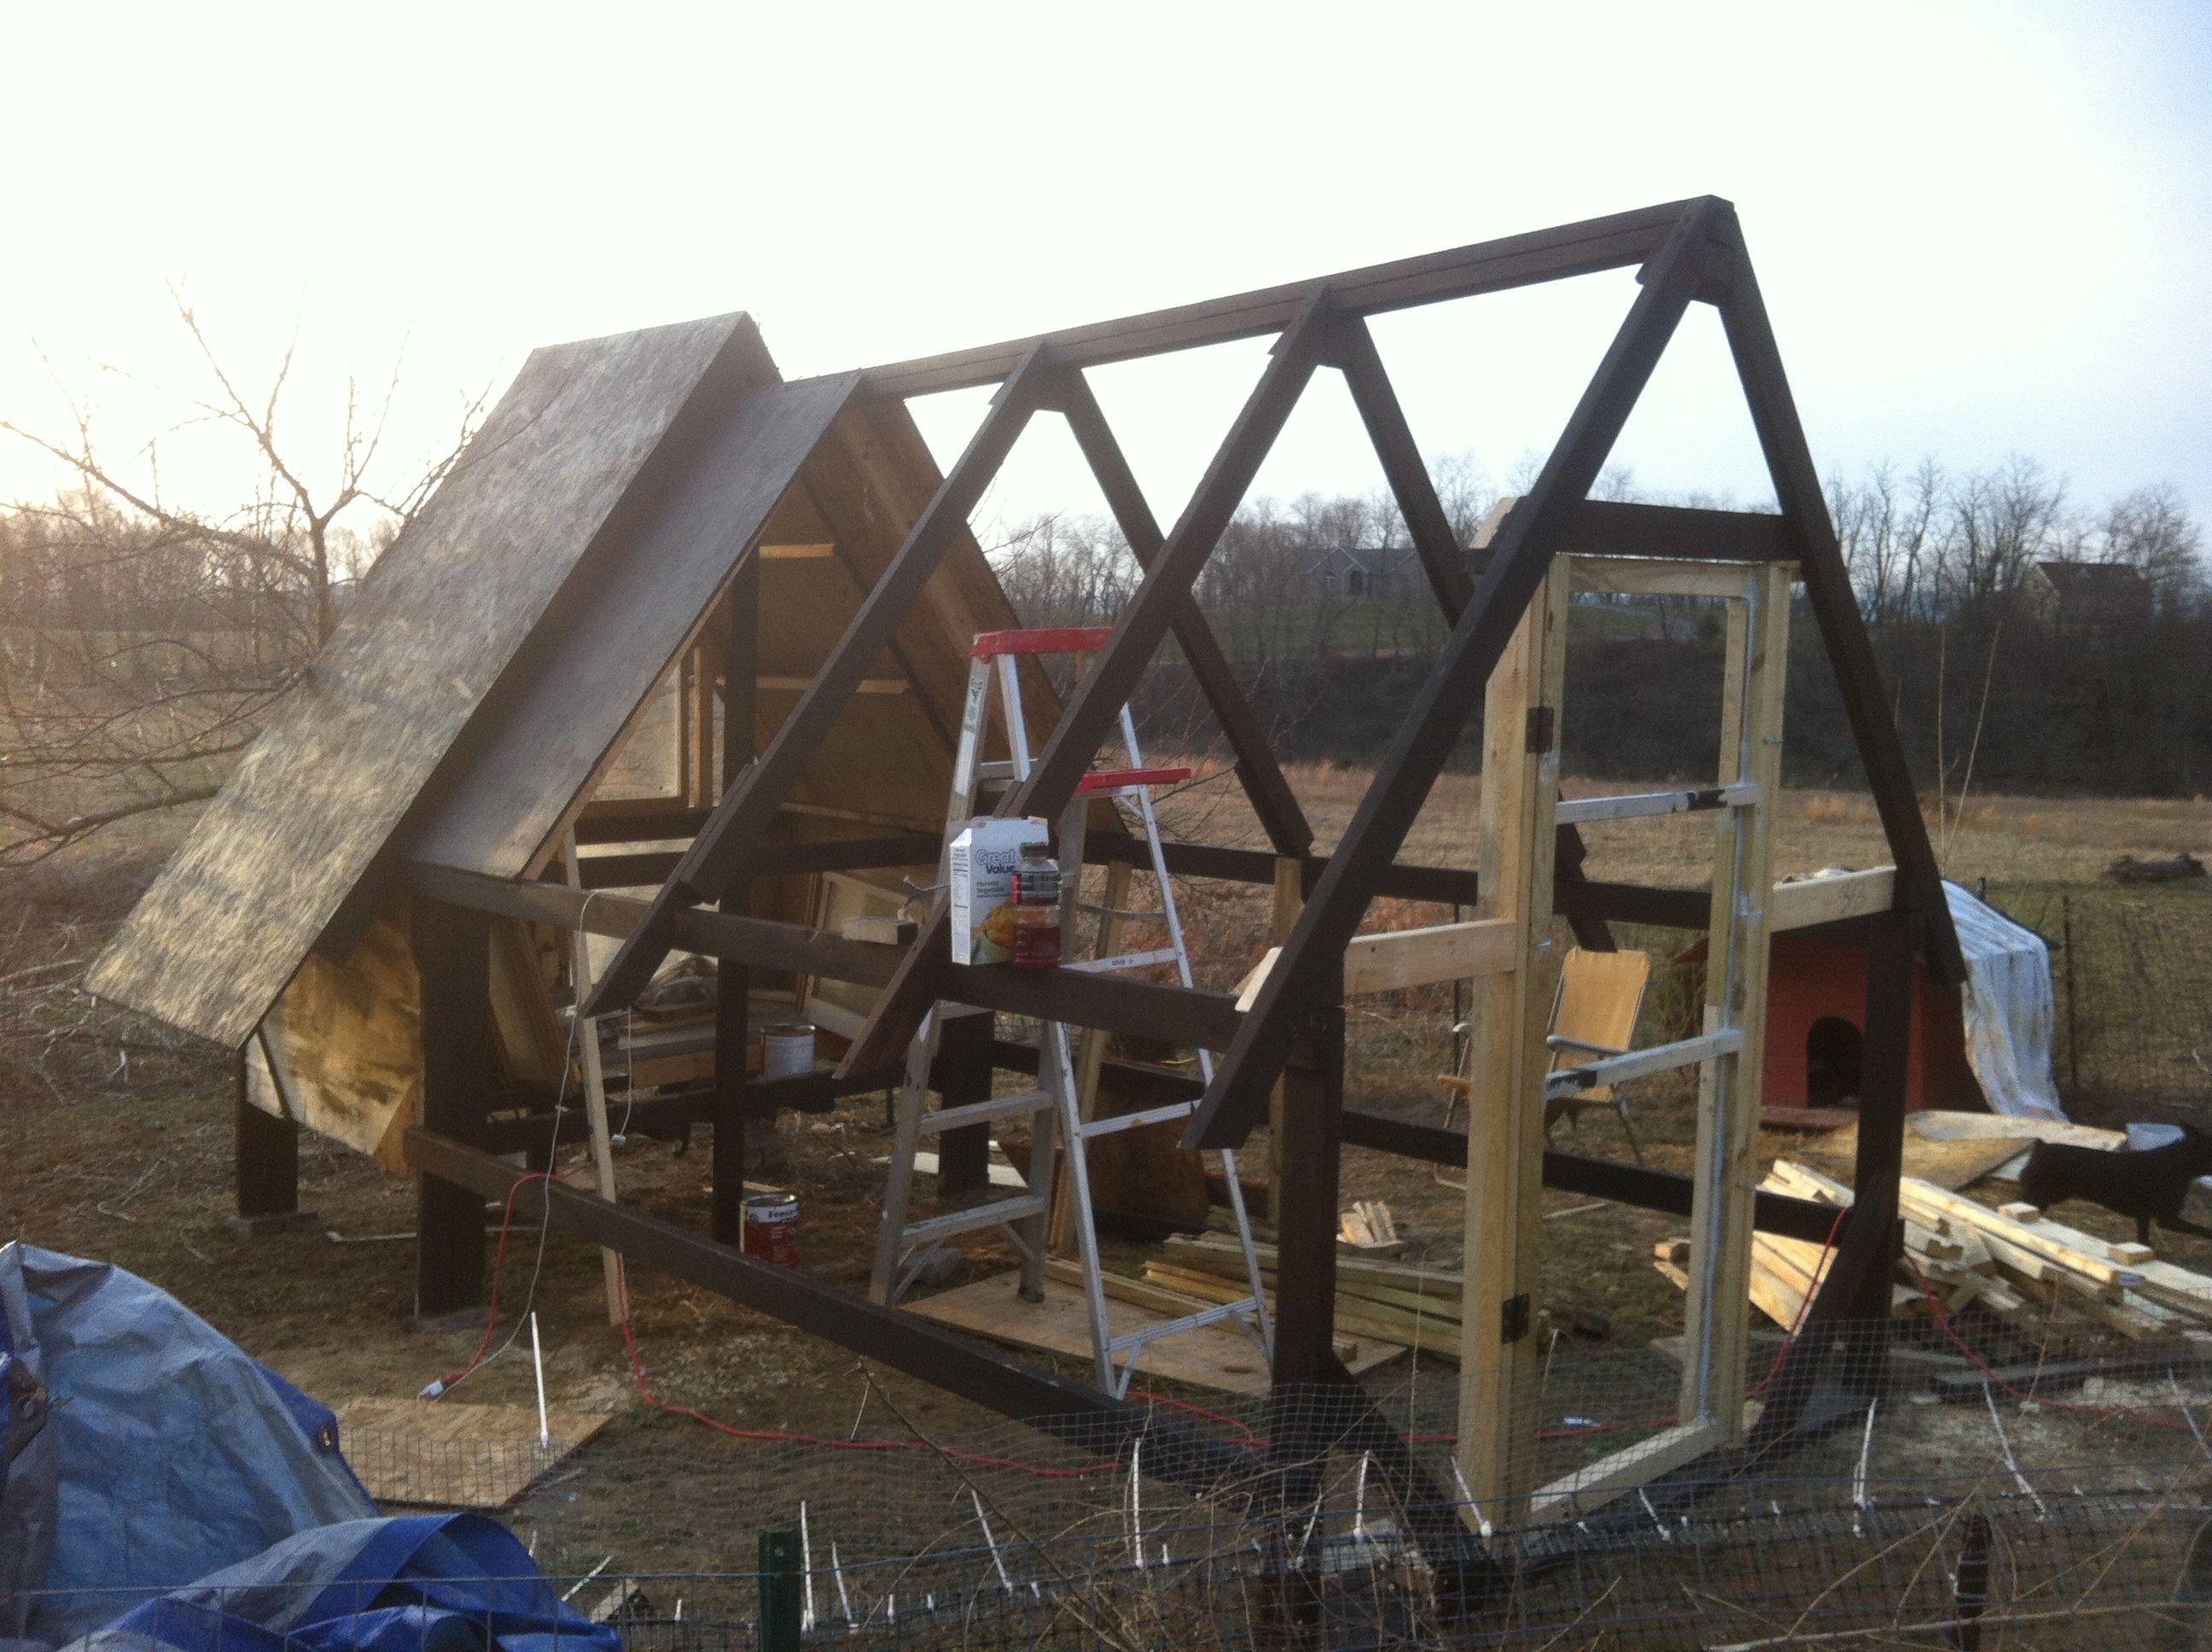 Working on my bird house!